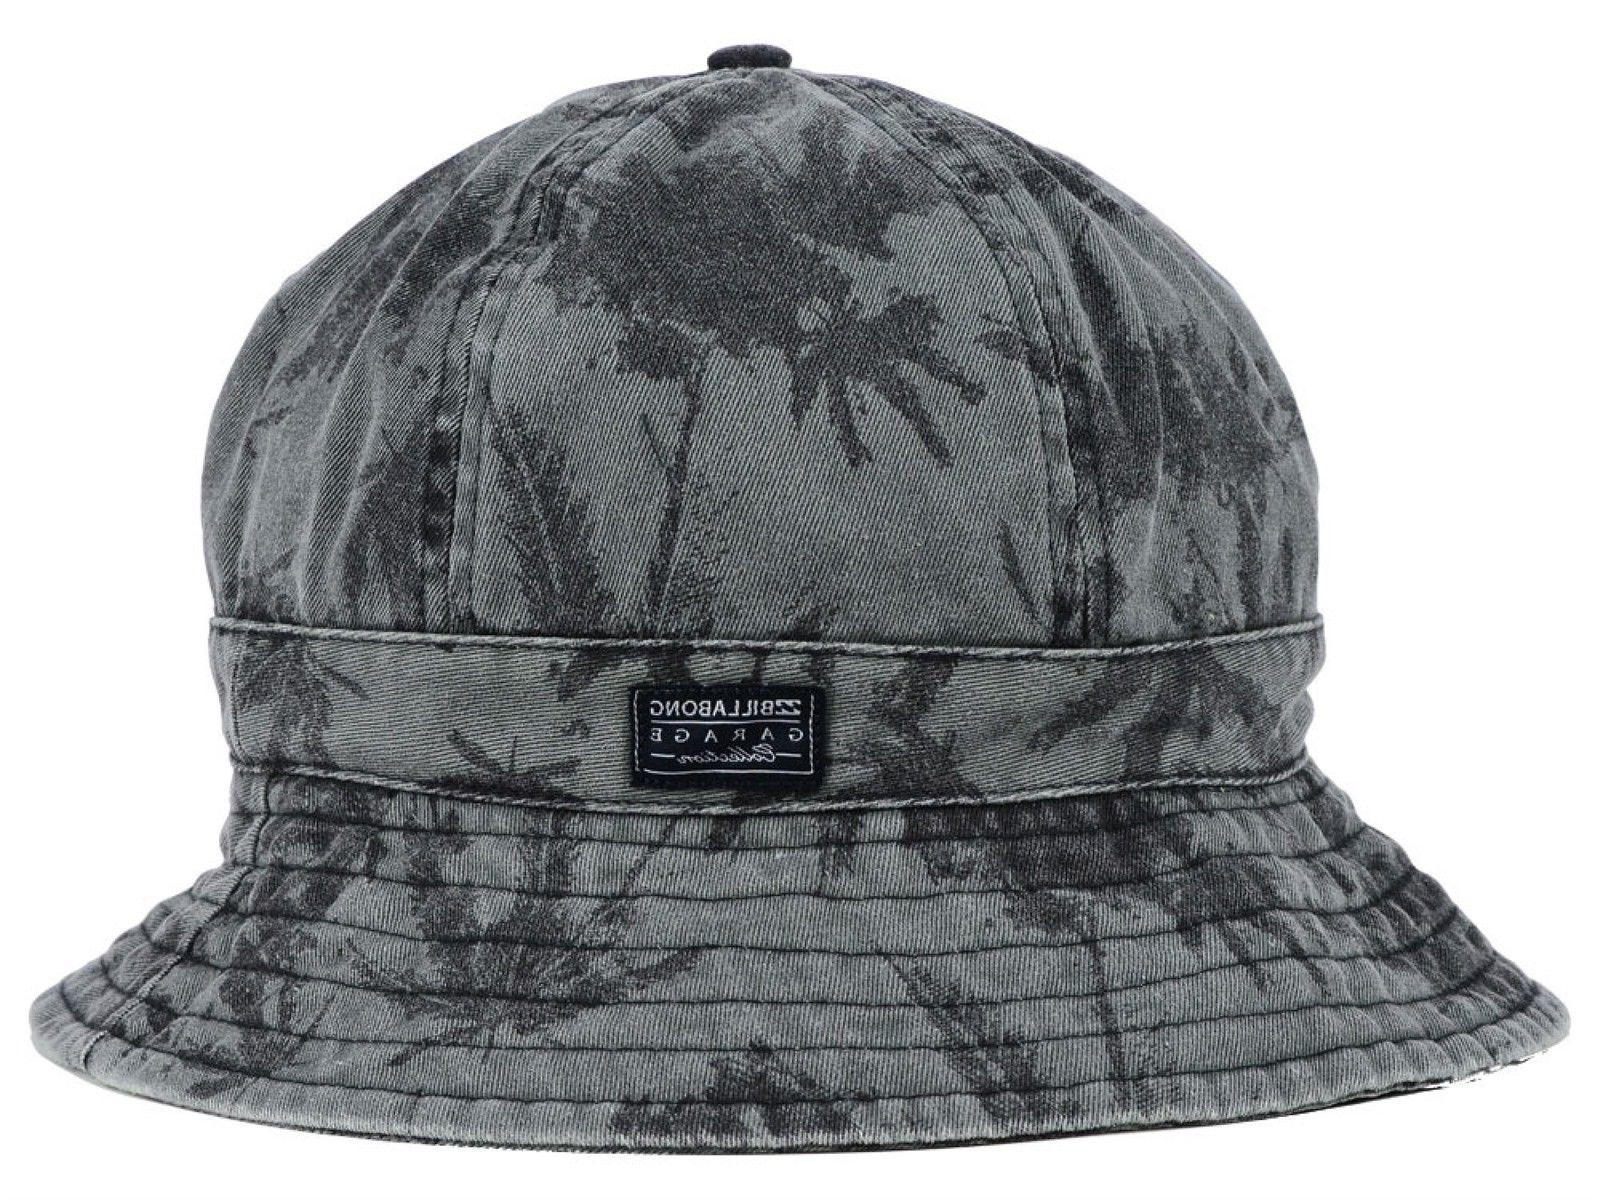 BILLABONG Dyed Canvas Gray/Black Bucket Hat